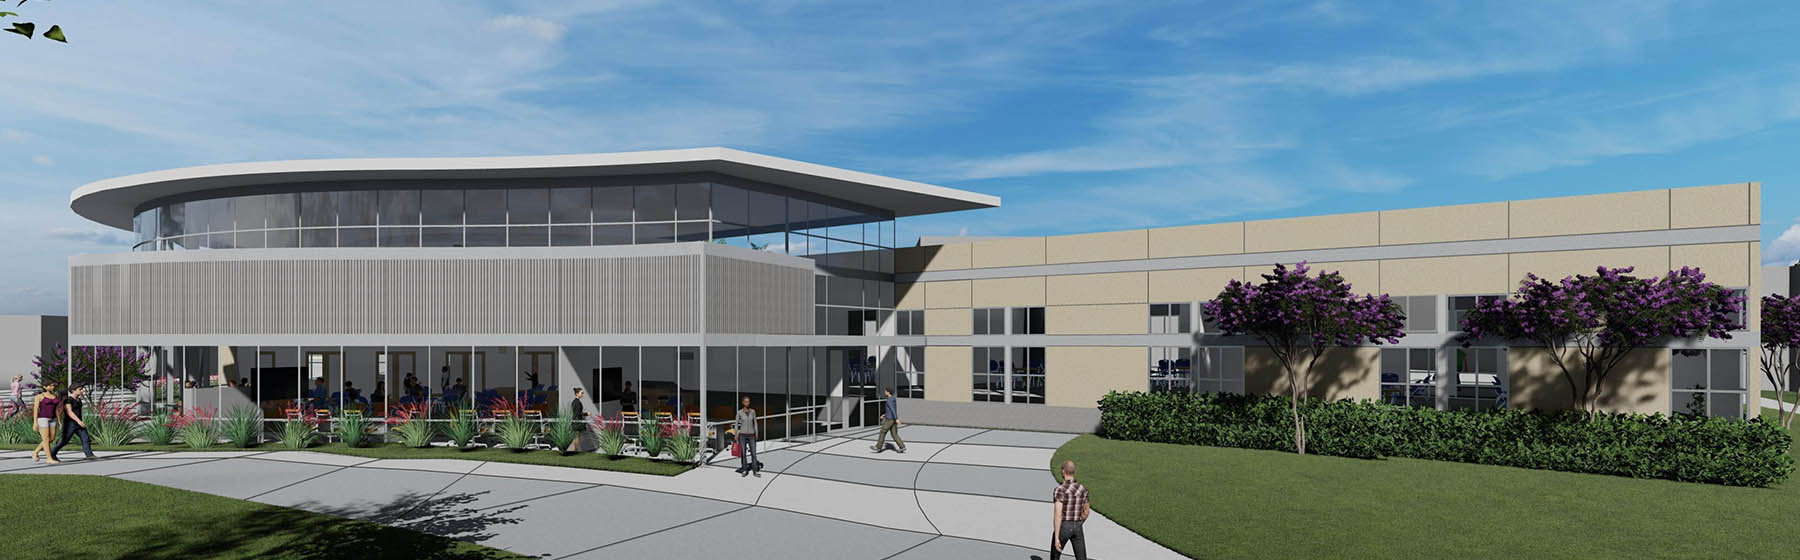 PROJECT UPDATE: Santa Teresa High School